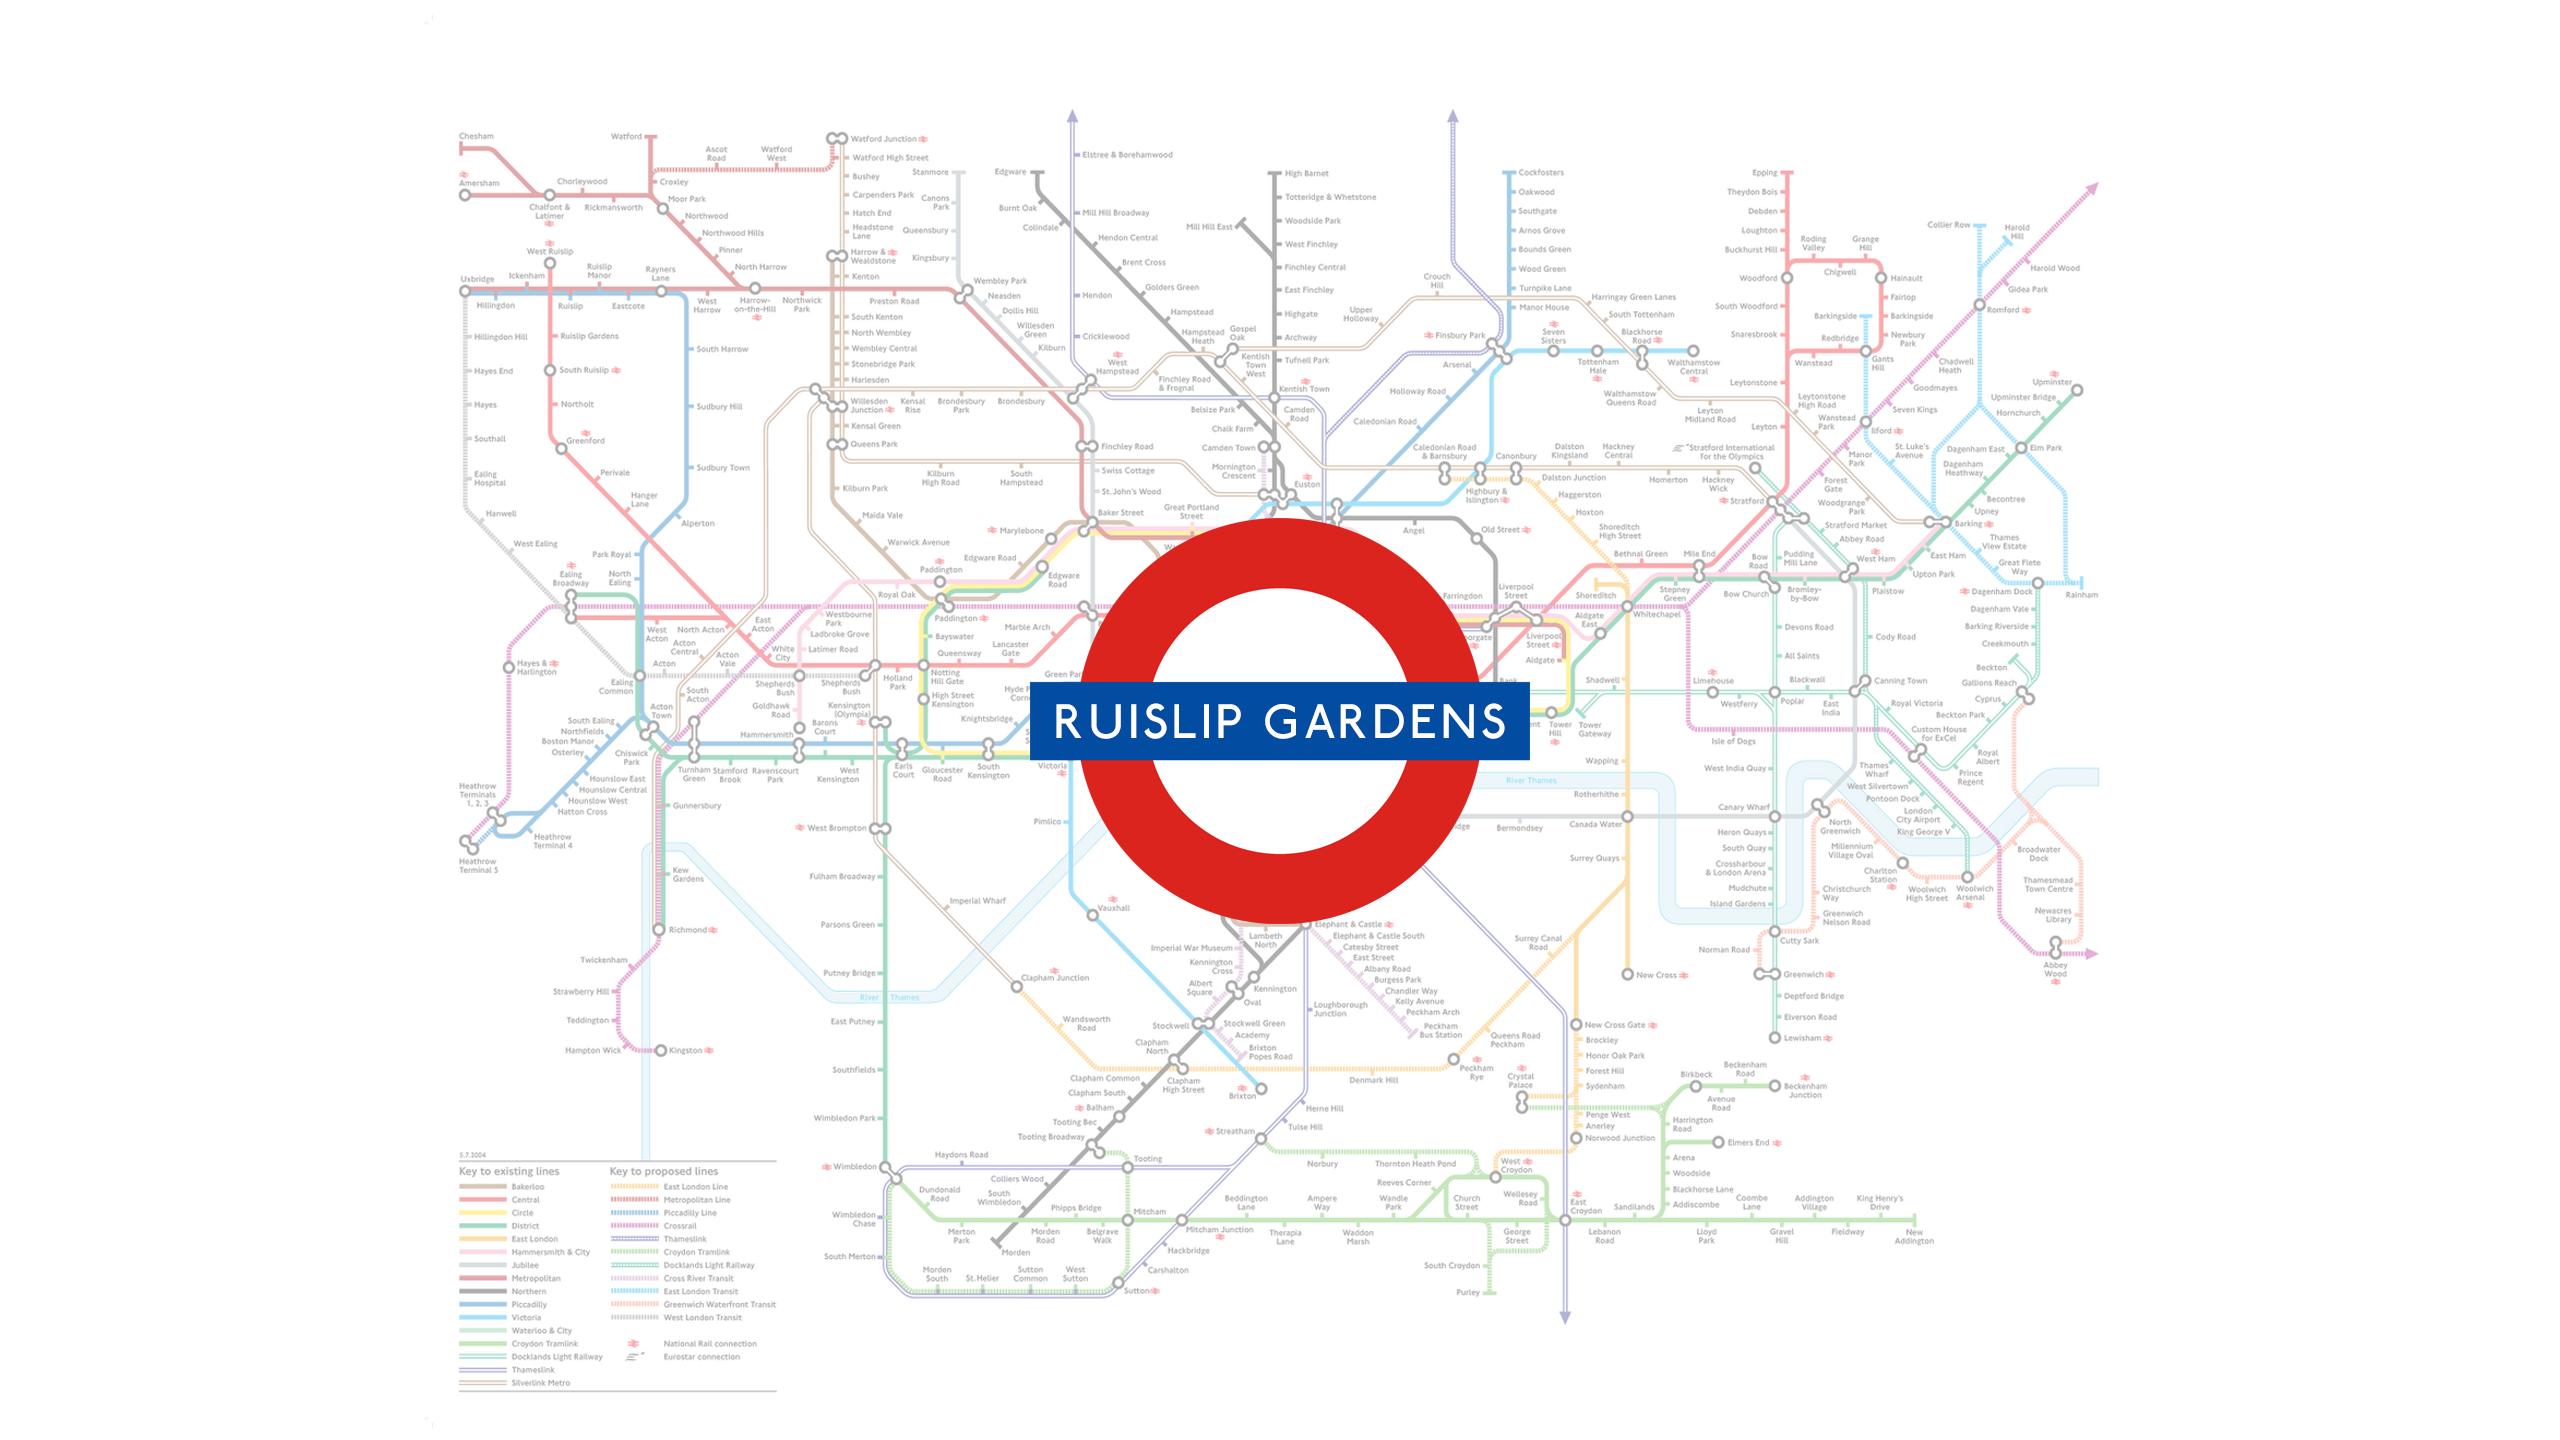 Ruislip Gardens (Map)